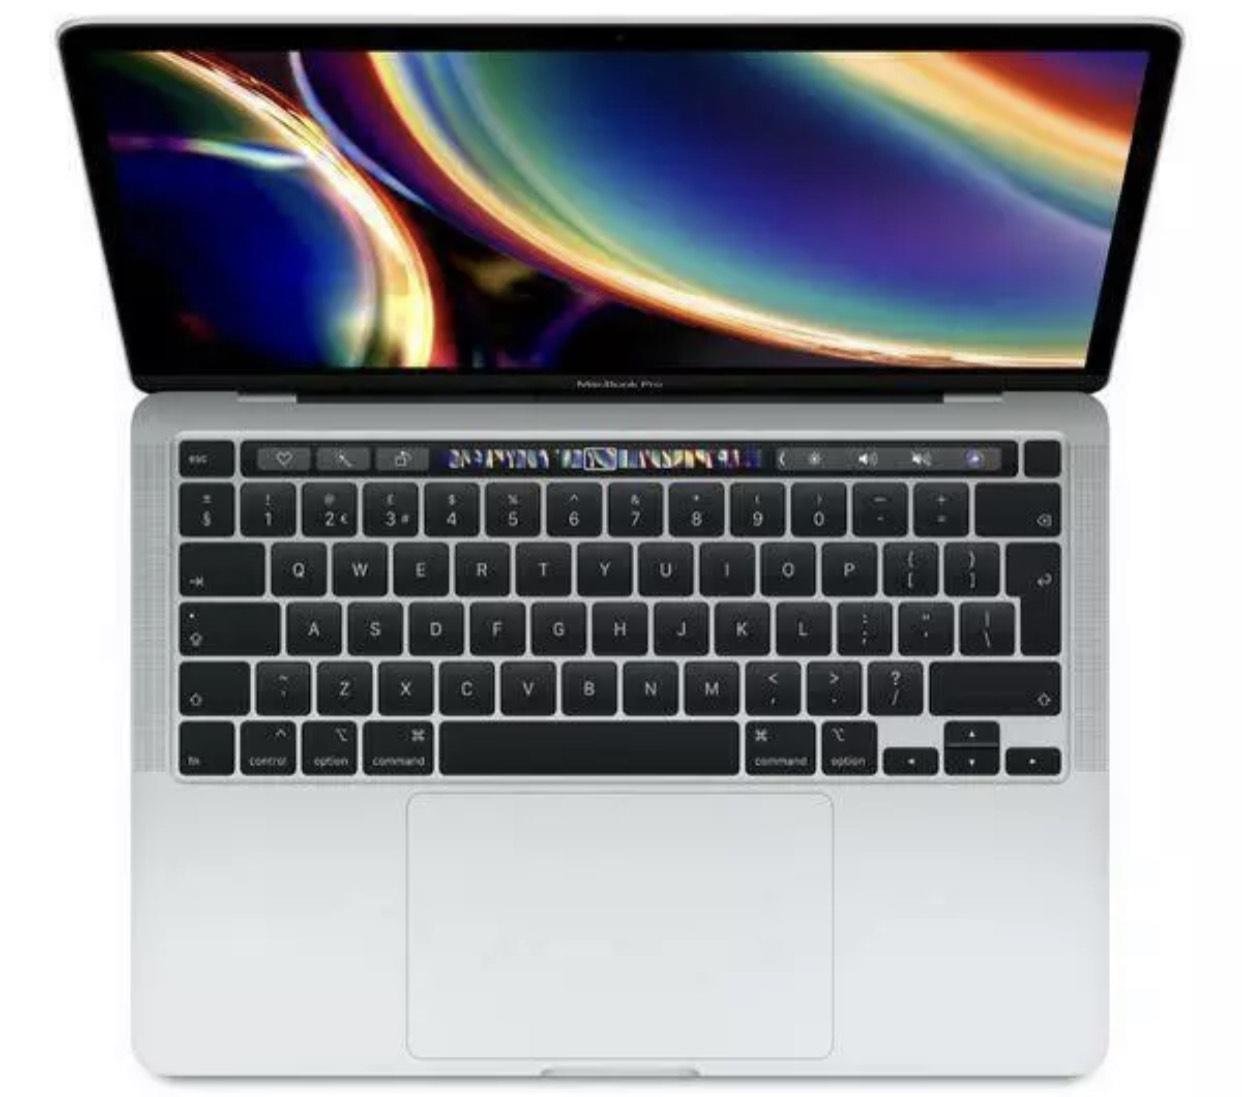 Refurbished Apple MacBook Pro 13' 2020 A2289 256GB SSD 8GB RAM Core i5 Laptop Silver £969.99 @ xsitems_ltd / ebay